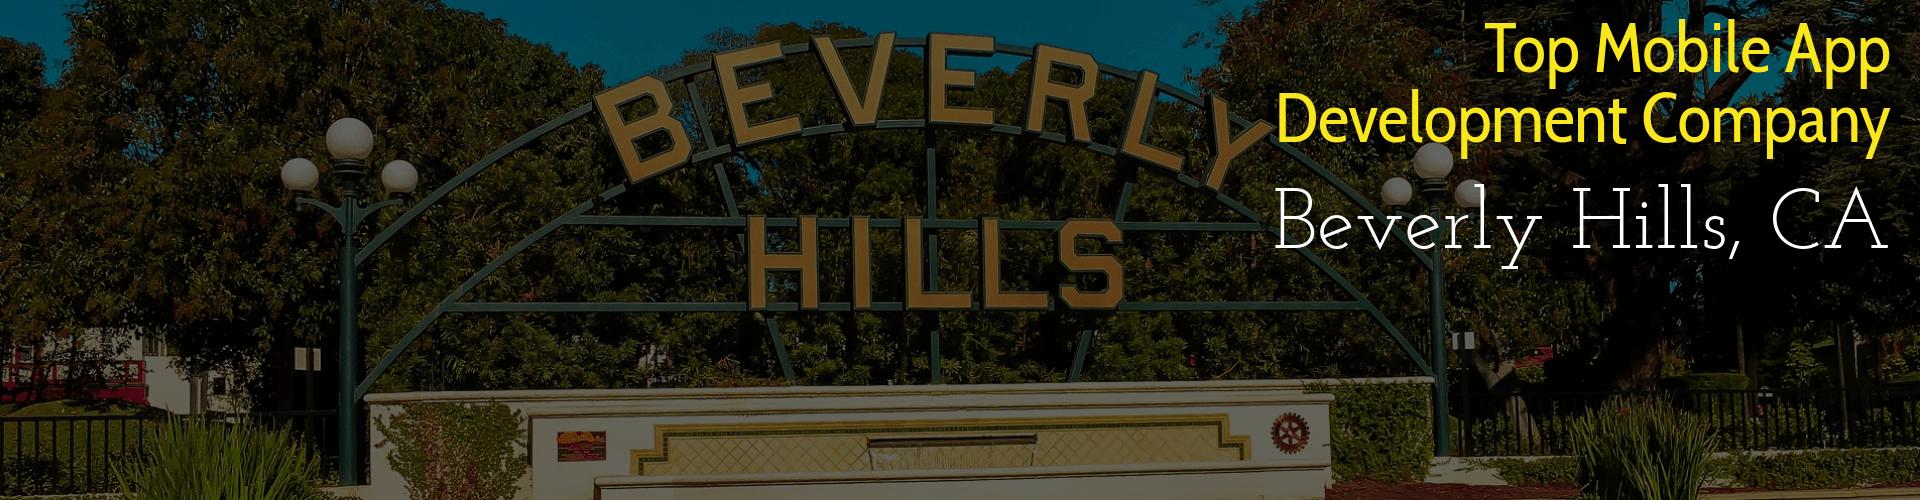 app developers beverly hills ca